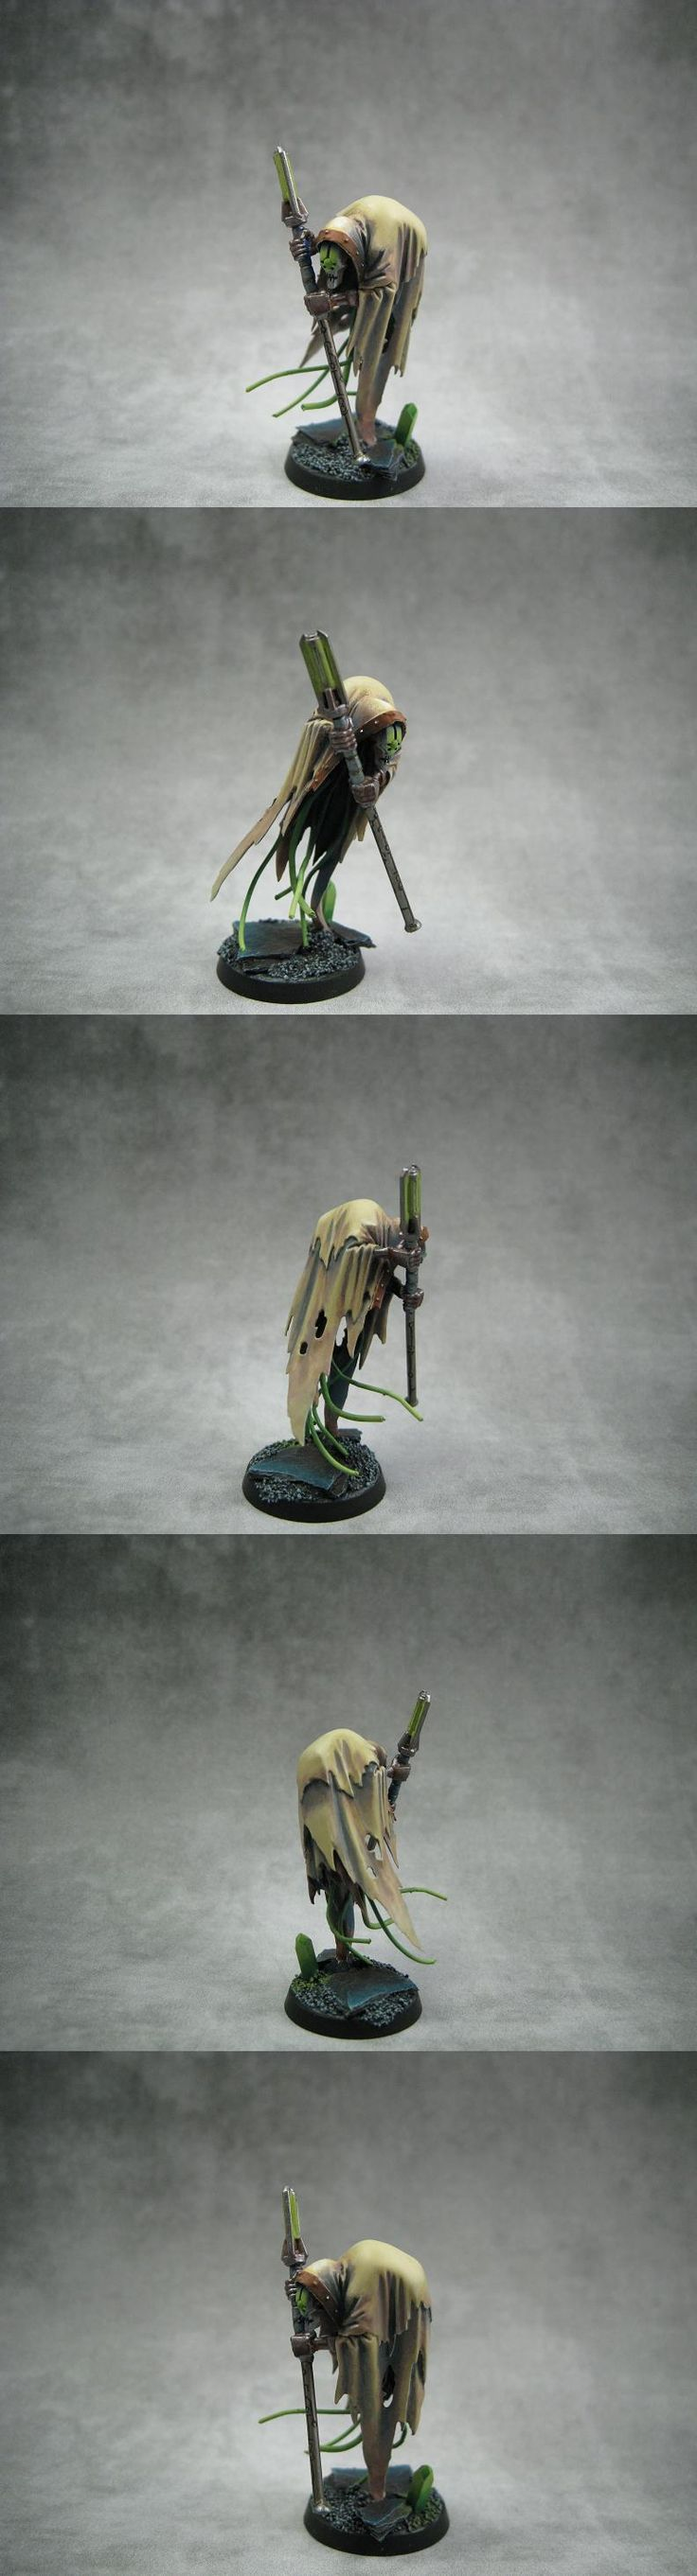 Games workshop colorado - Necron Cryptek Harbinger Of Despair